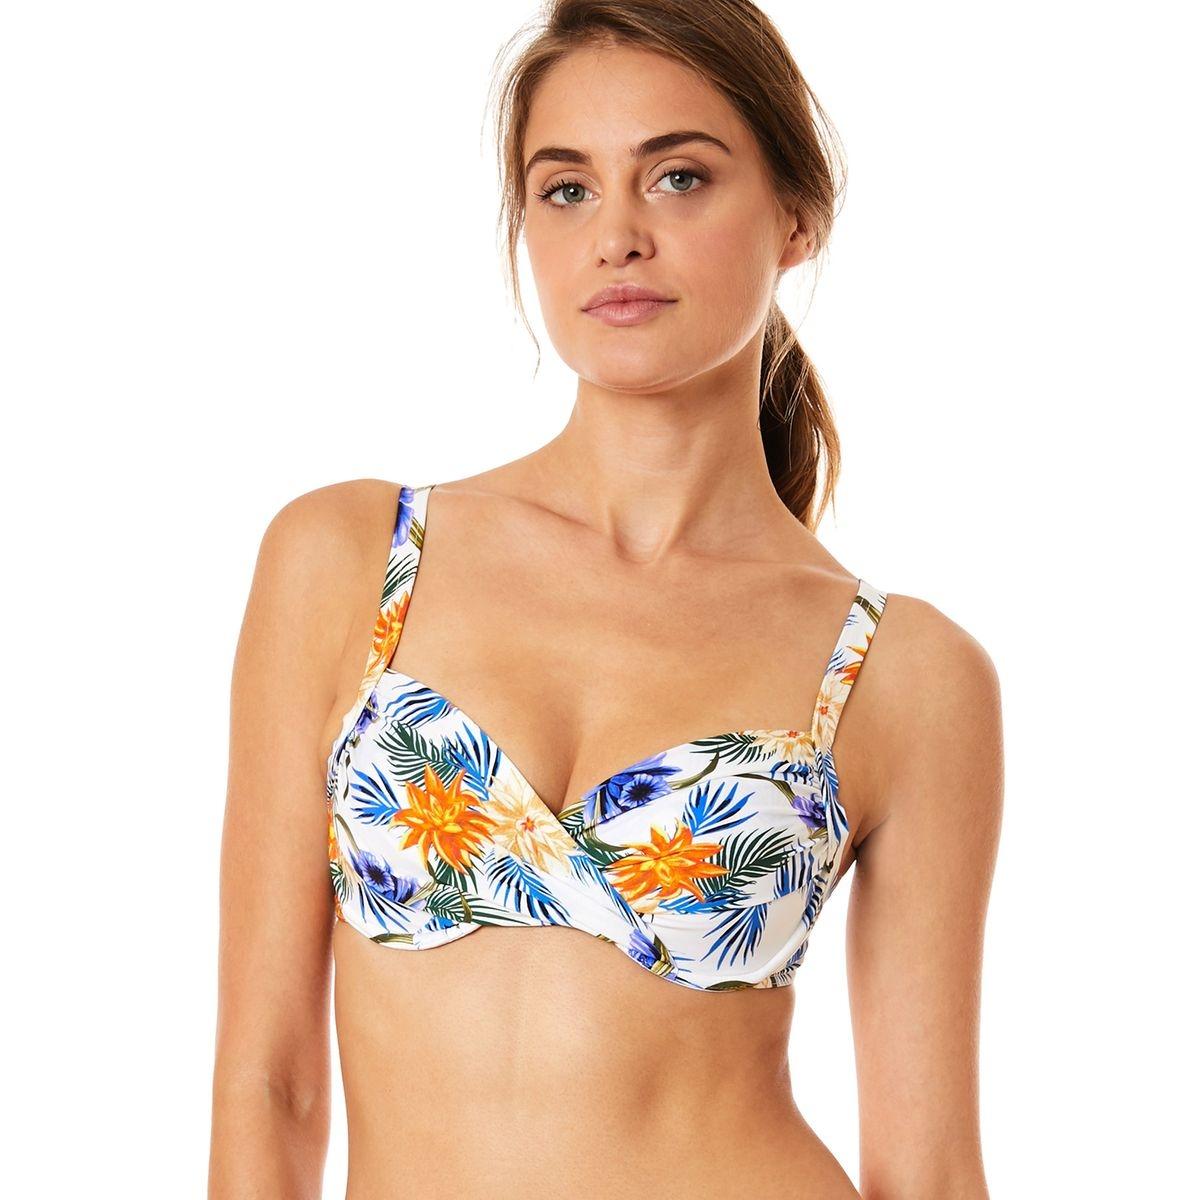 Haut de maillot de bain 2 pieces imprime retro tropical SASKIA PERGOLA Bonnet C